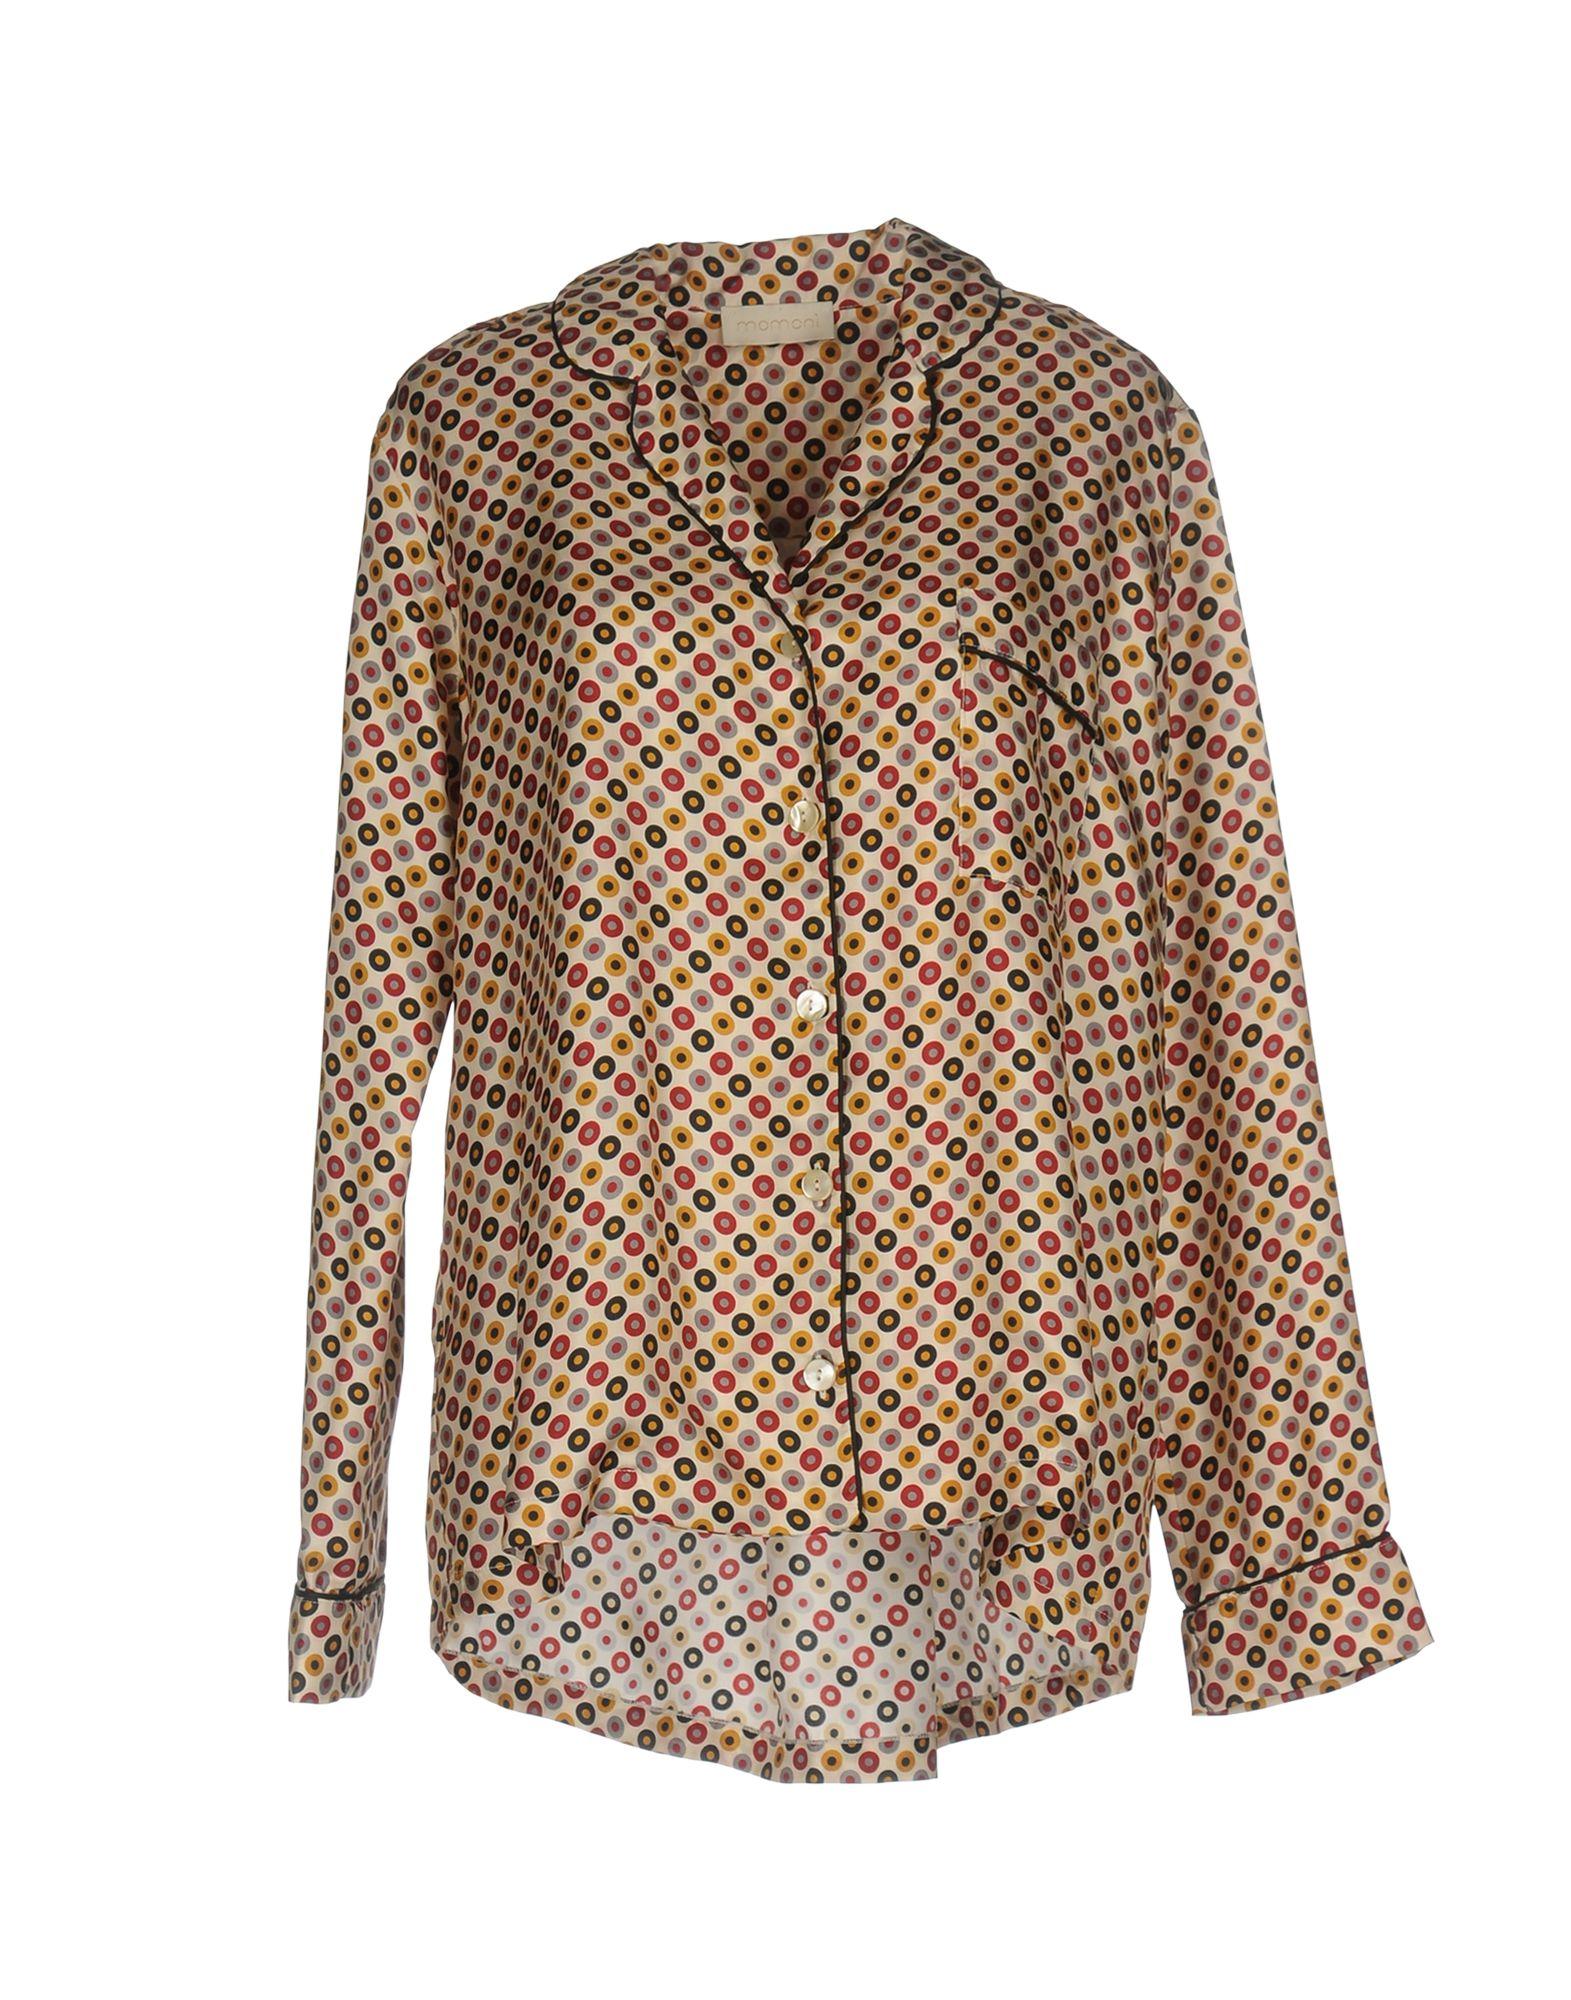 Camicie E Bluse Fantasia Momoní Donna - Acquista online su sHVroJftF